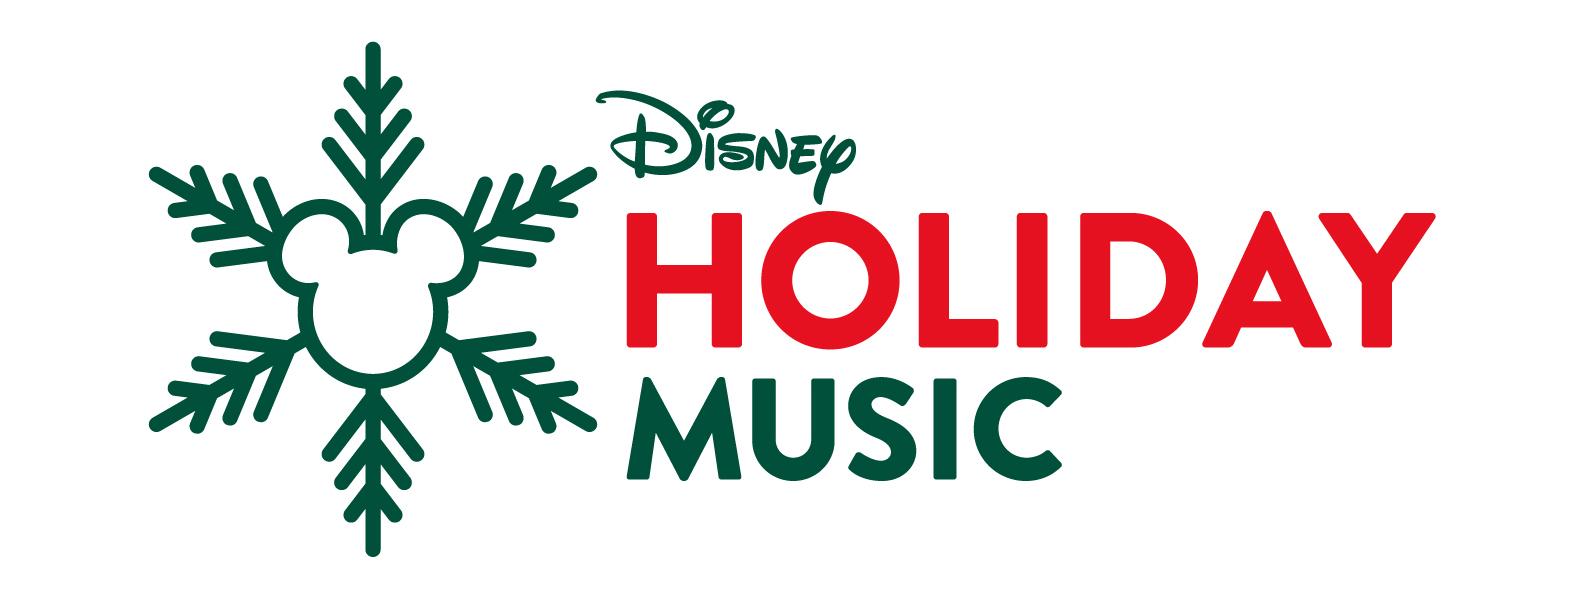 DisneyHolidayMusic-1_2.jpg